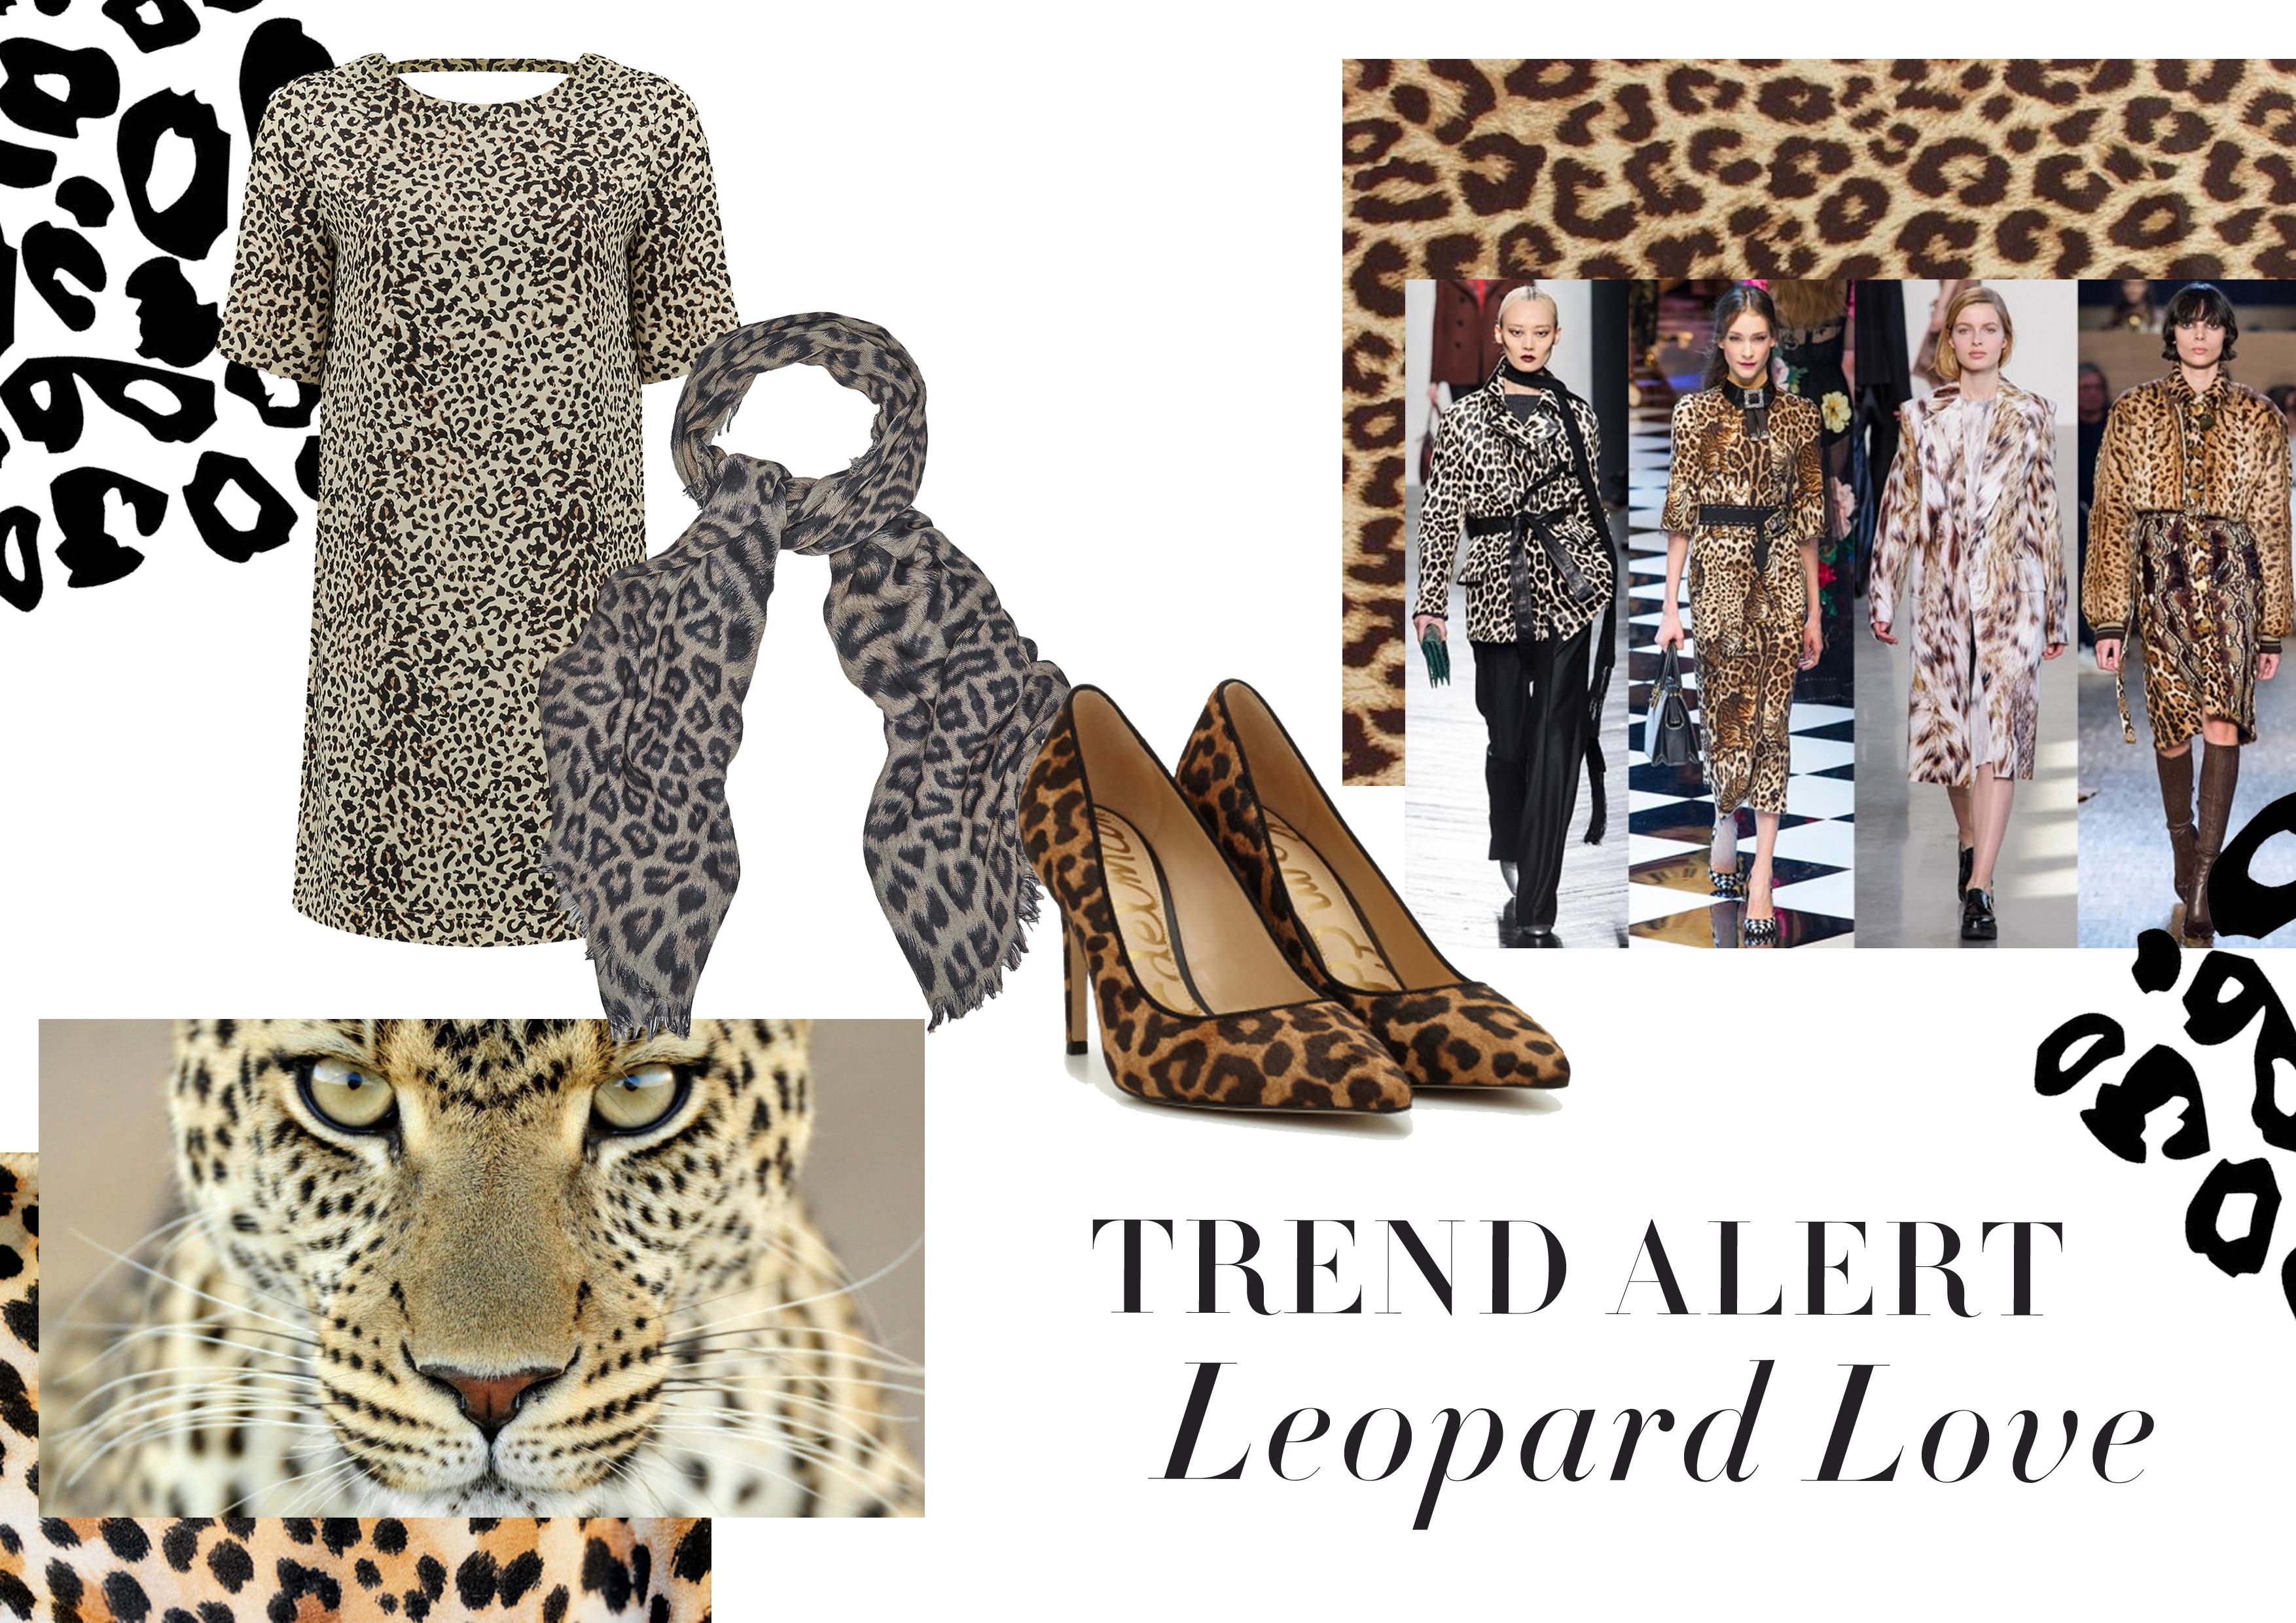 Trend Alert: Leopard Love